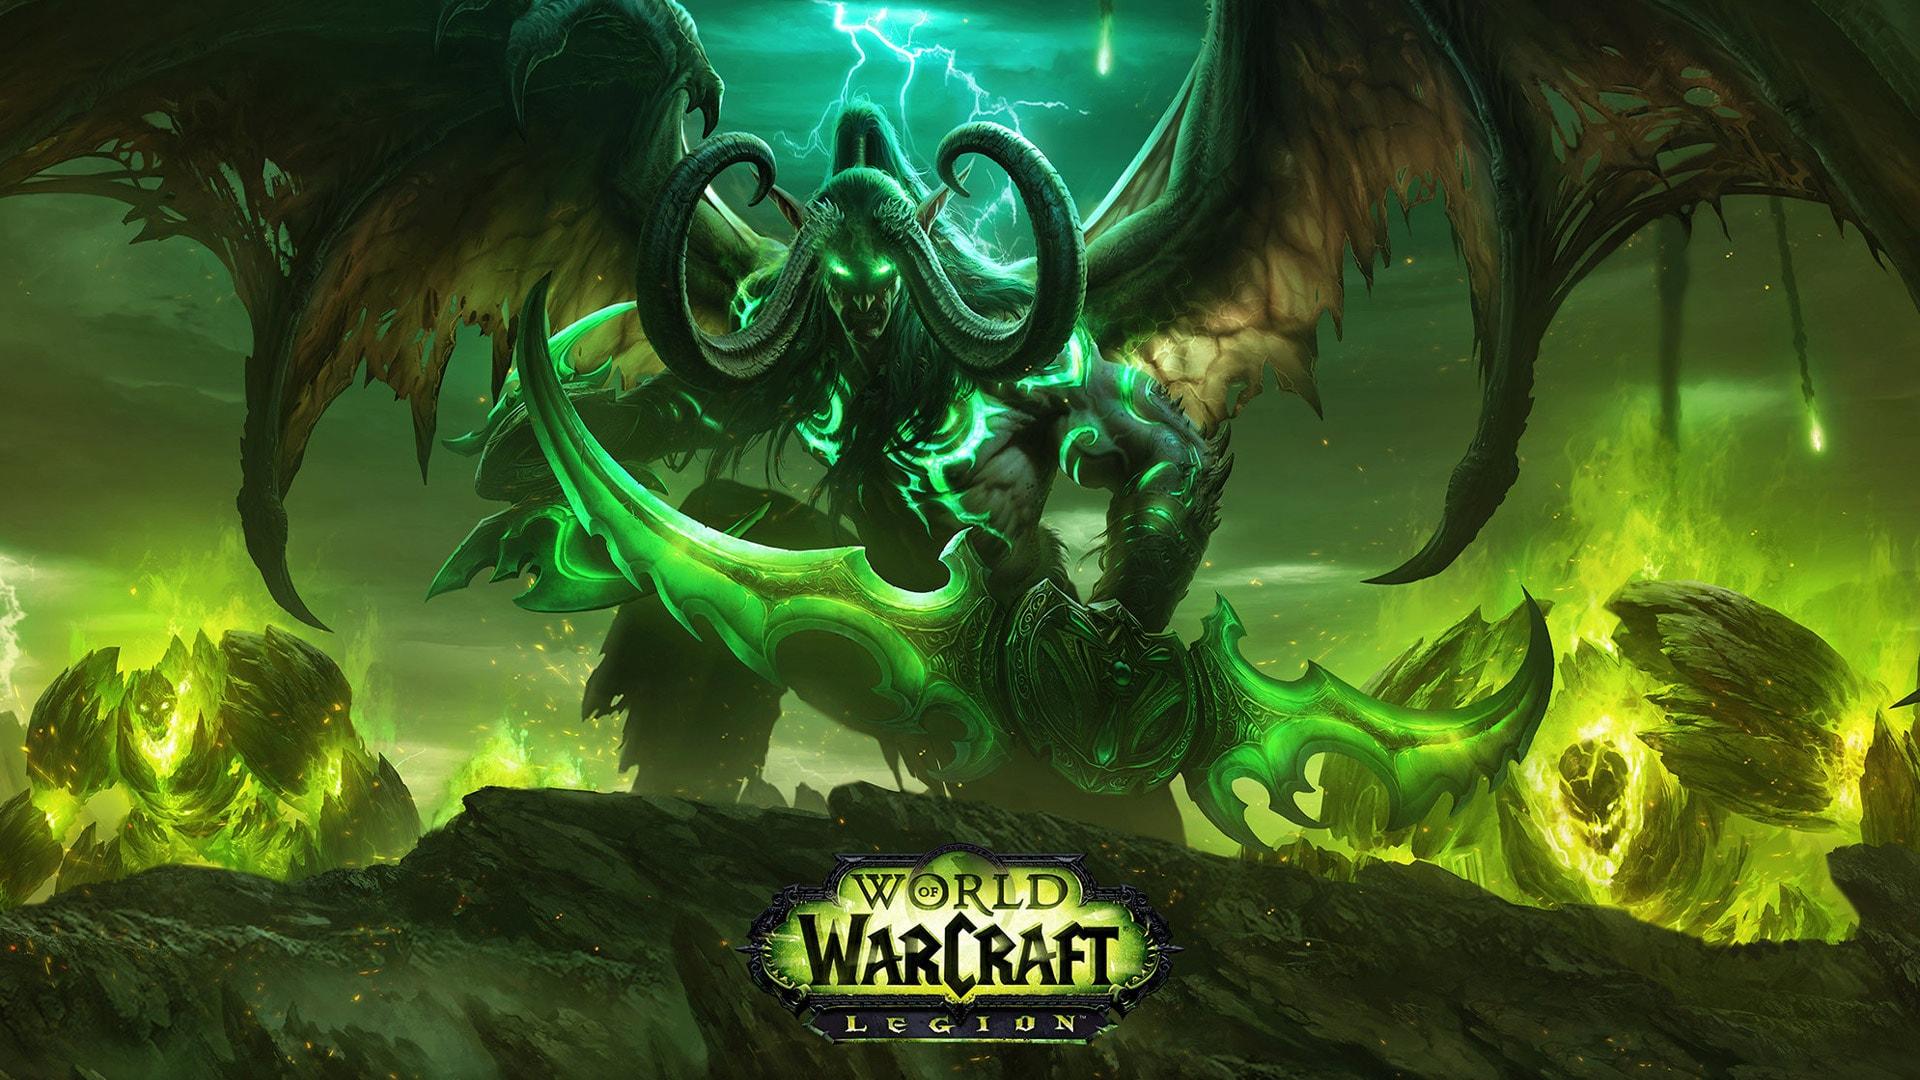 World of Warcraft: Legion Background